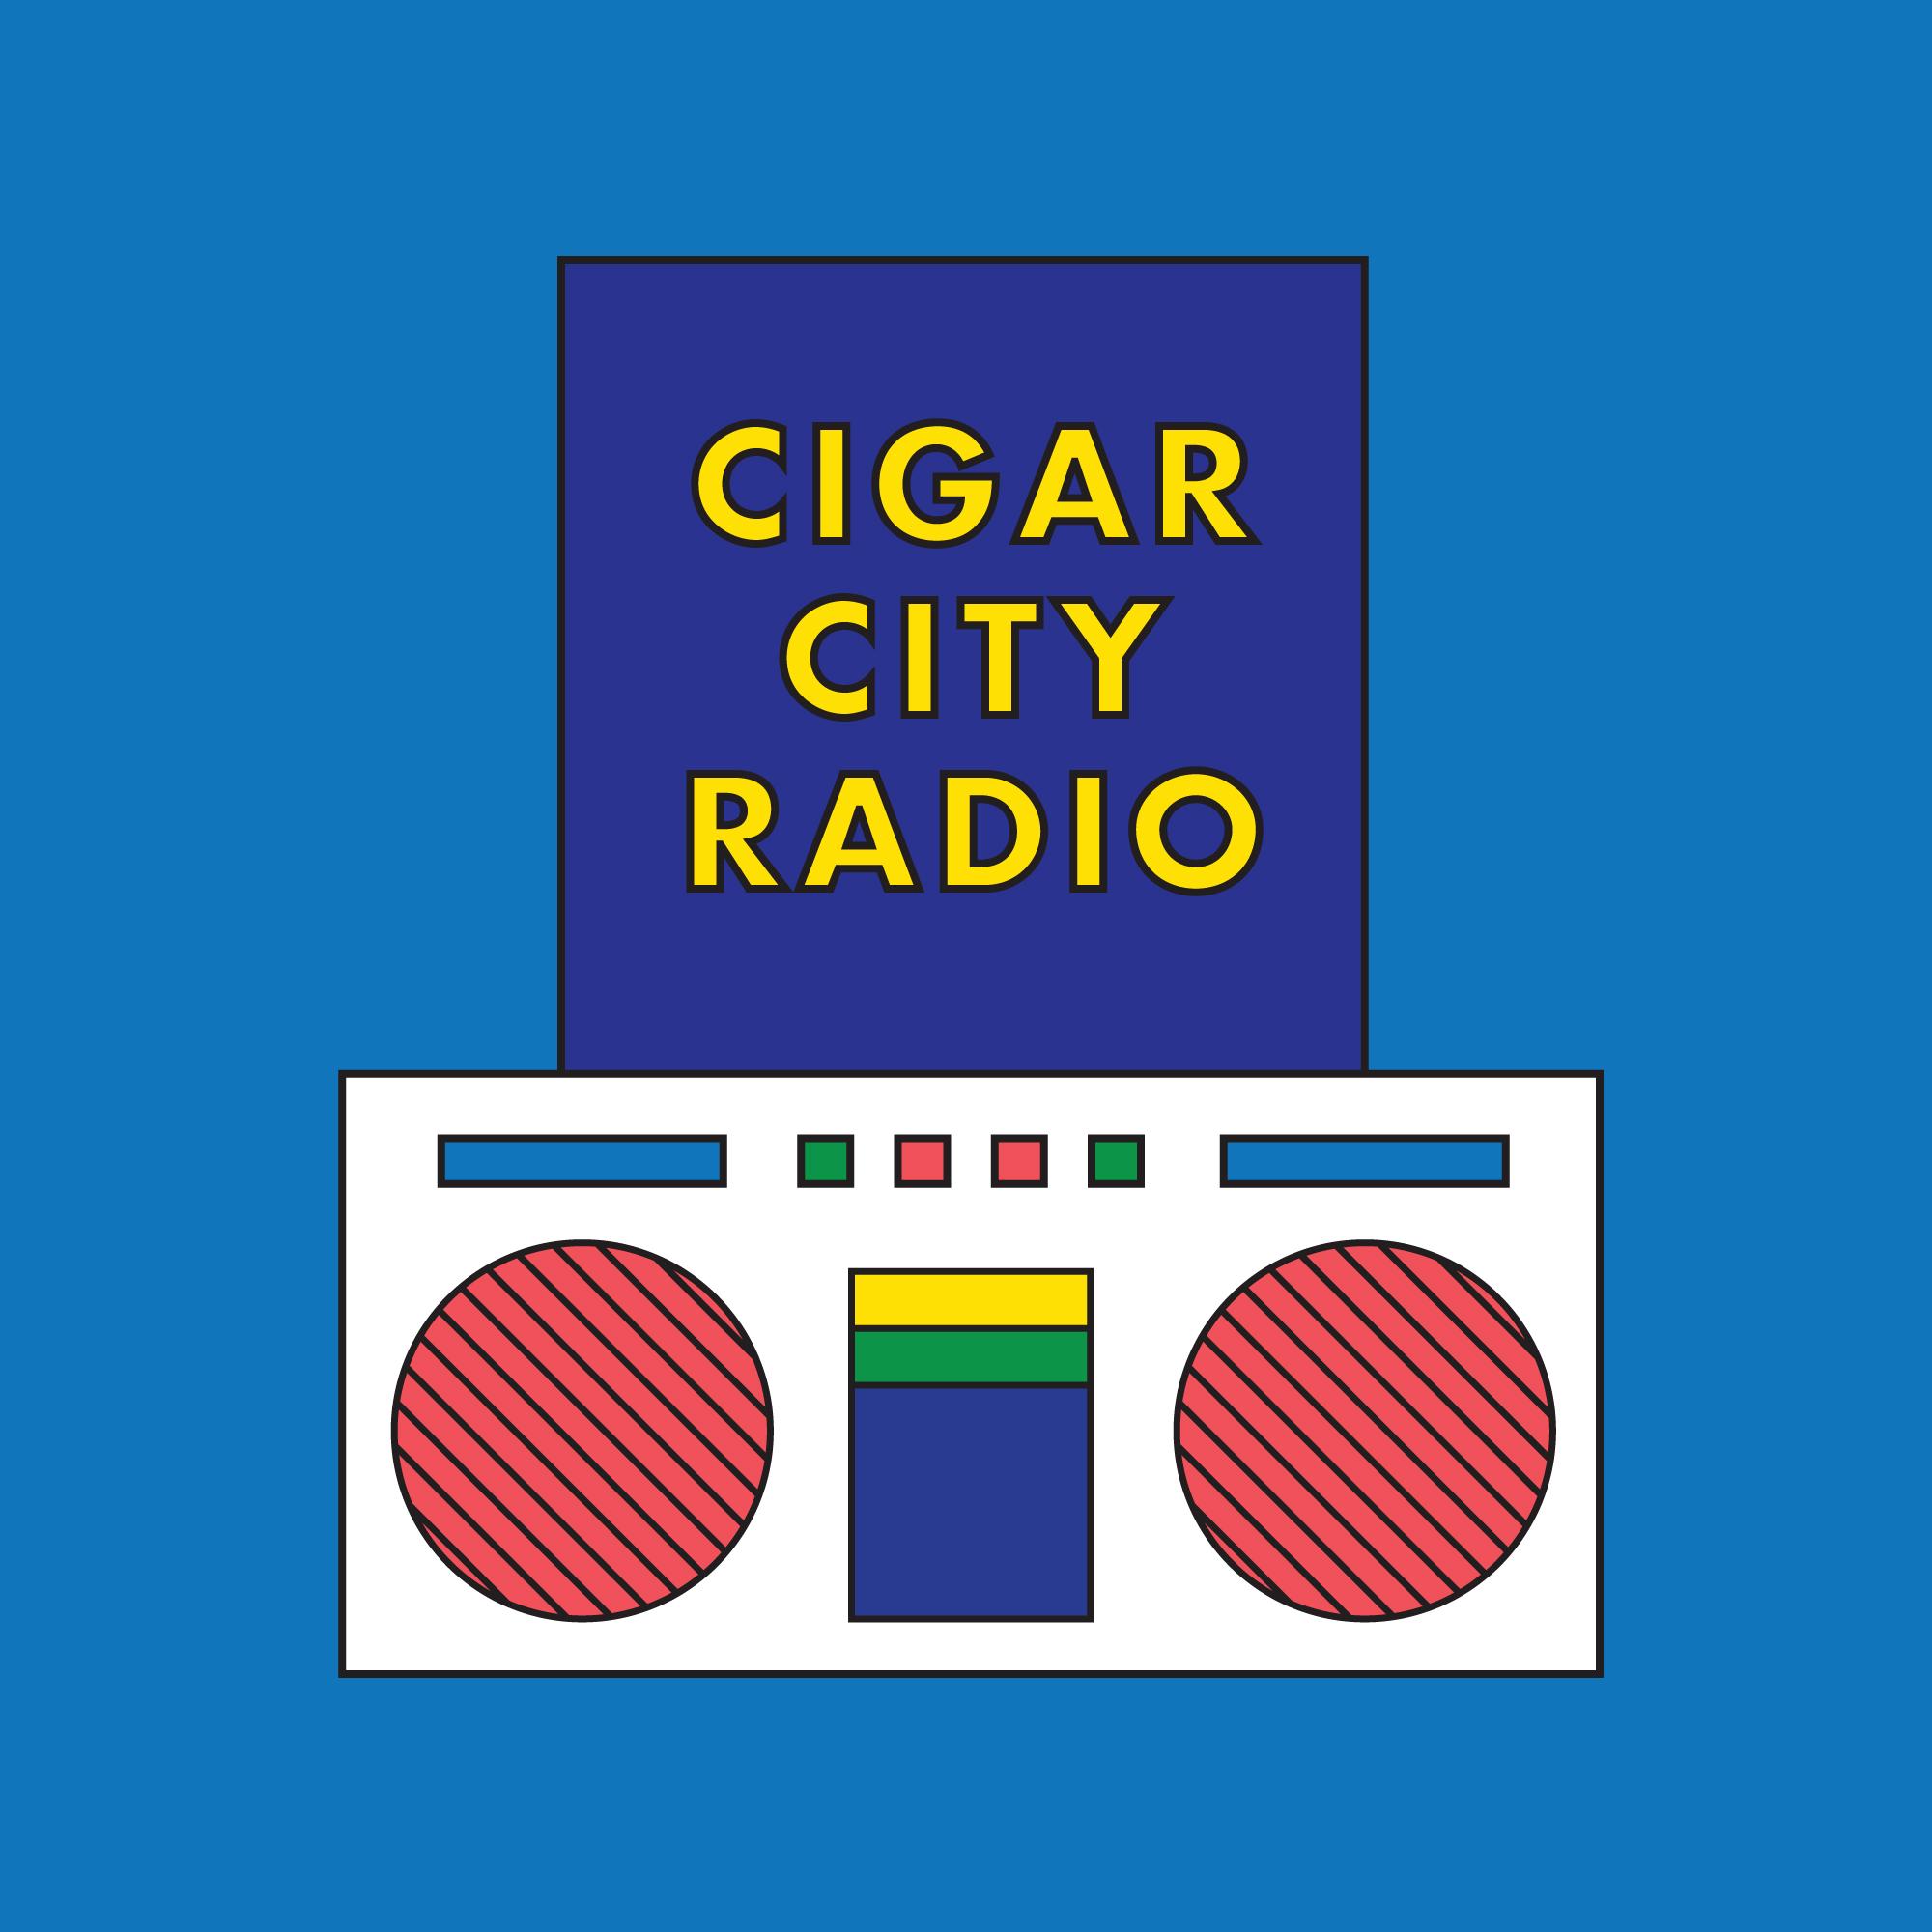 Cigar_City_Radio_1.jpg